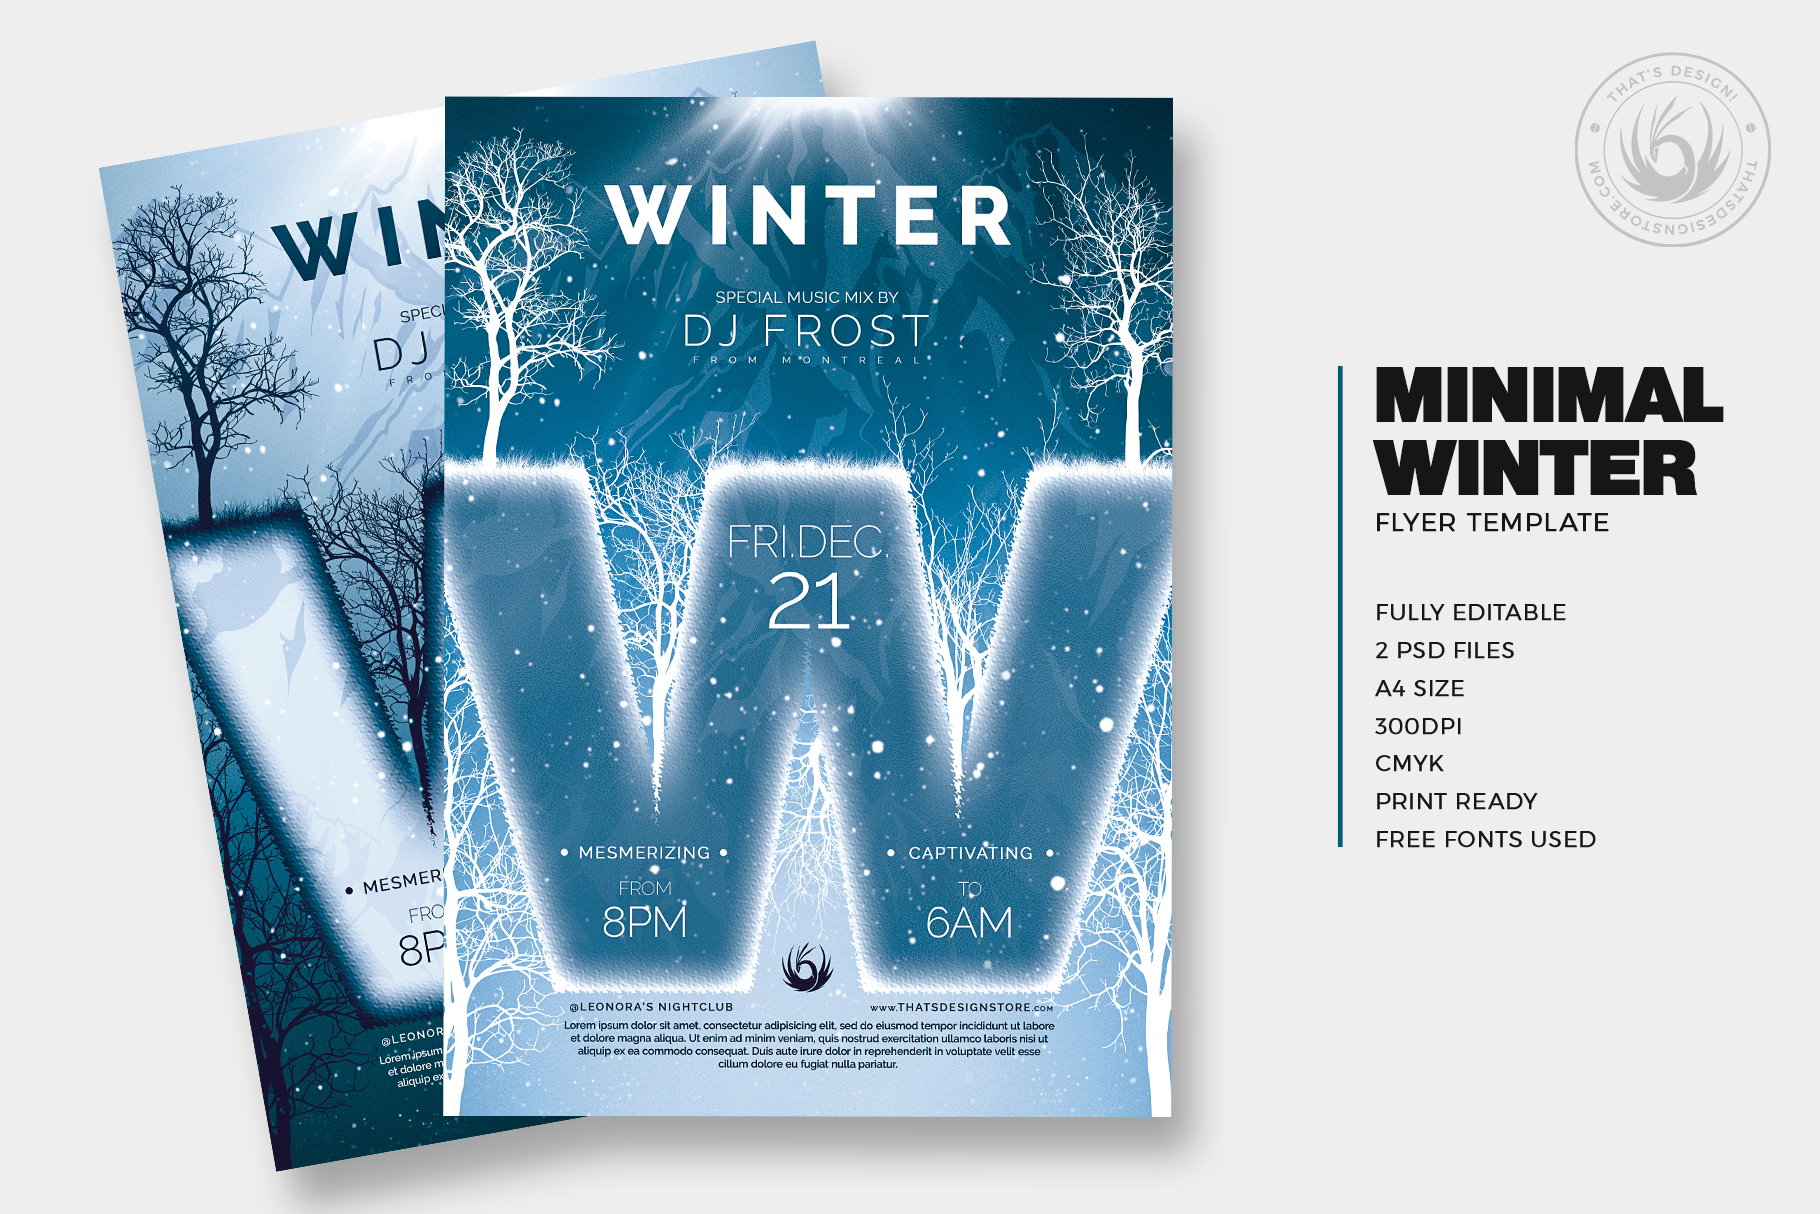 Minimal Winter Flyer Template